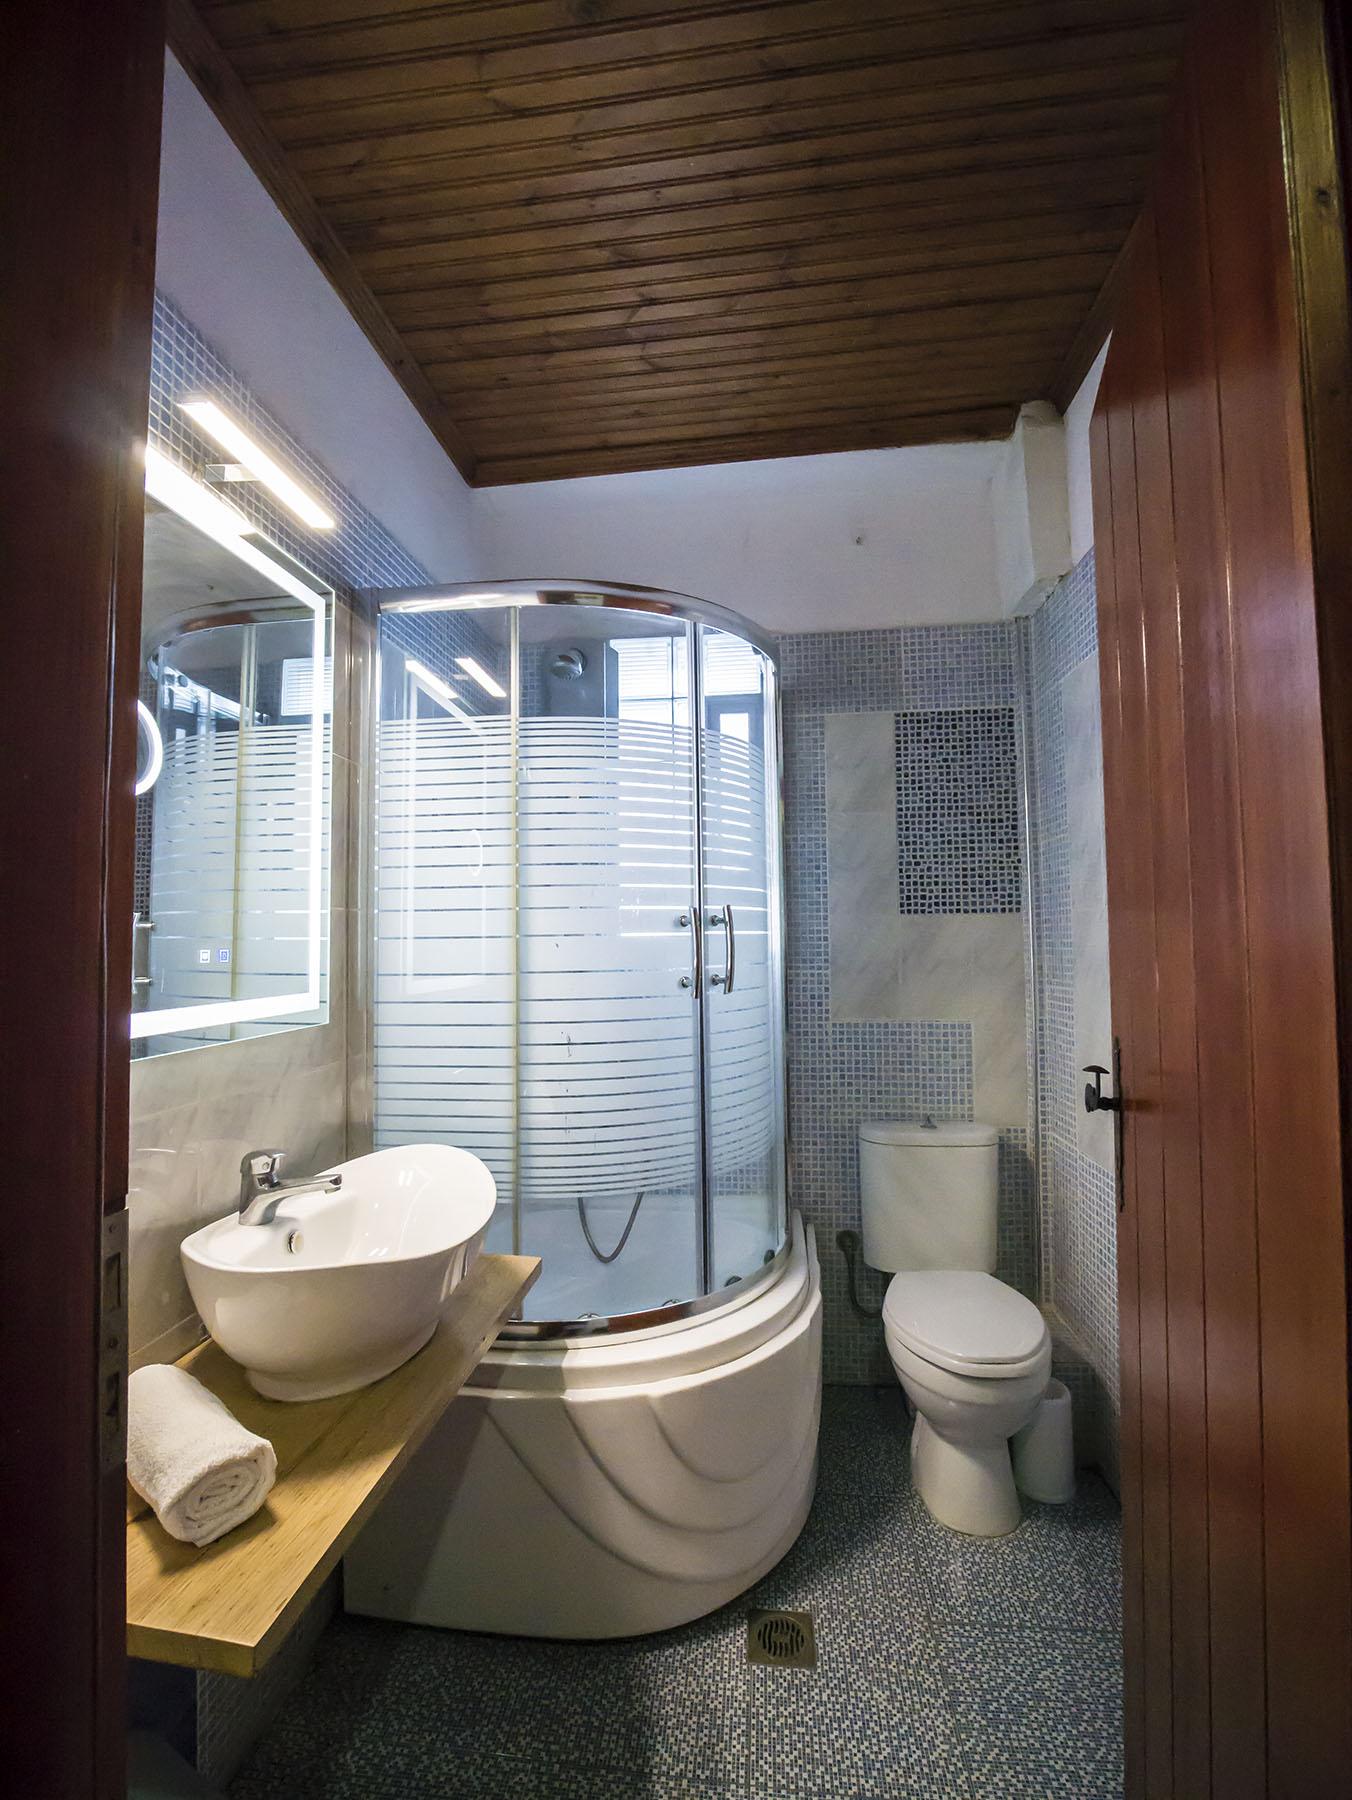 konaki hotel mansion superior room accommodation tsagarada mylopotamos pelion fireplace greece travel 04